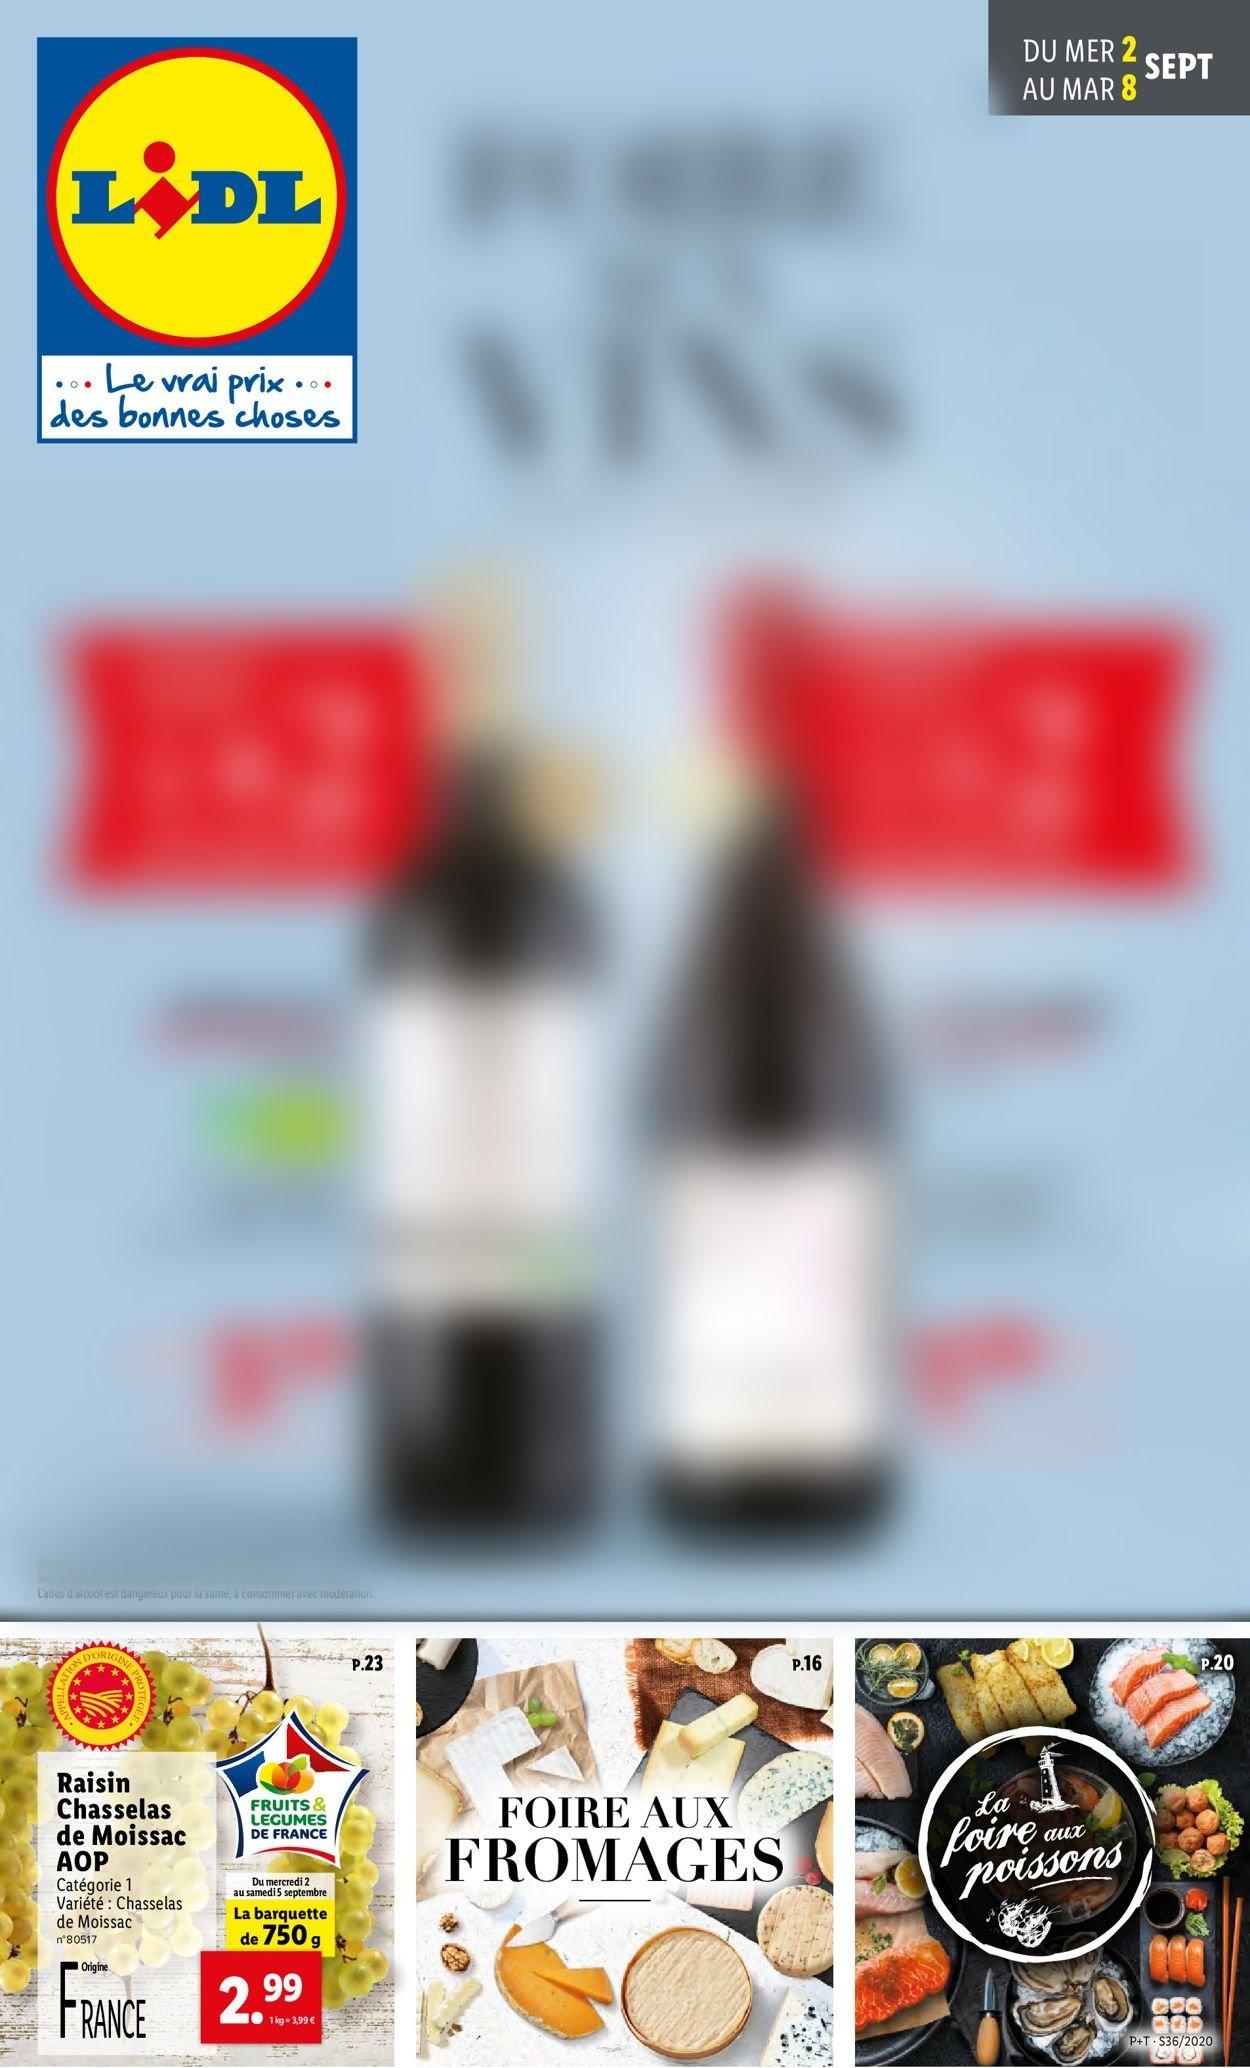 Lidl Catalogue - 02.09-08.09.2020